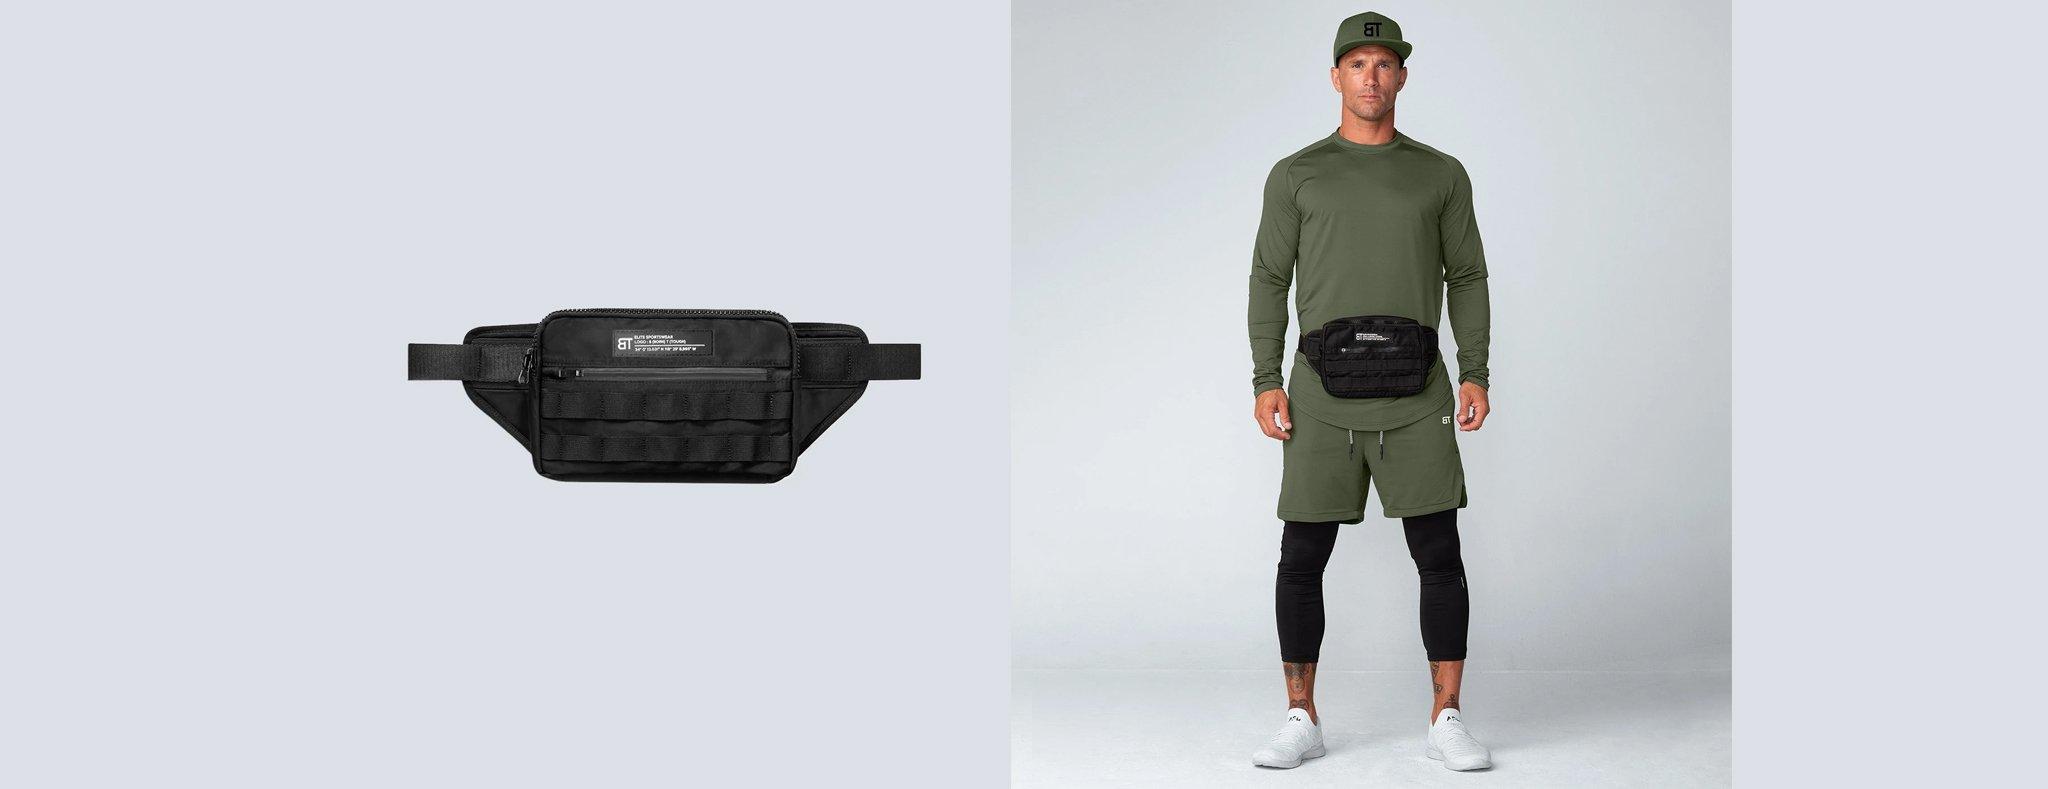 Born Tough Molle Utility Cross Body Bag Black